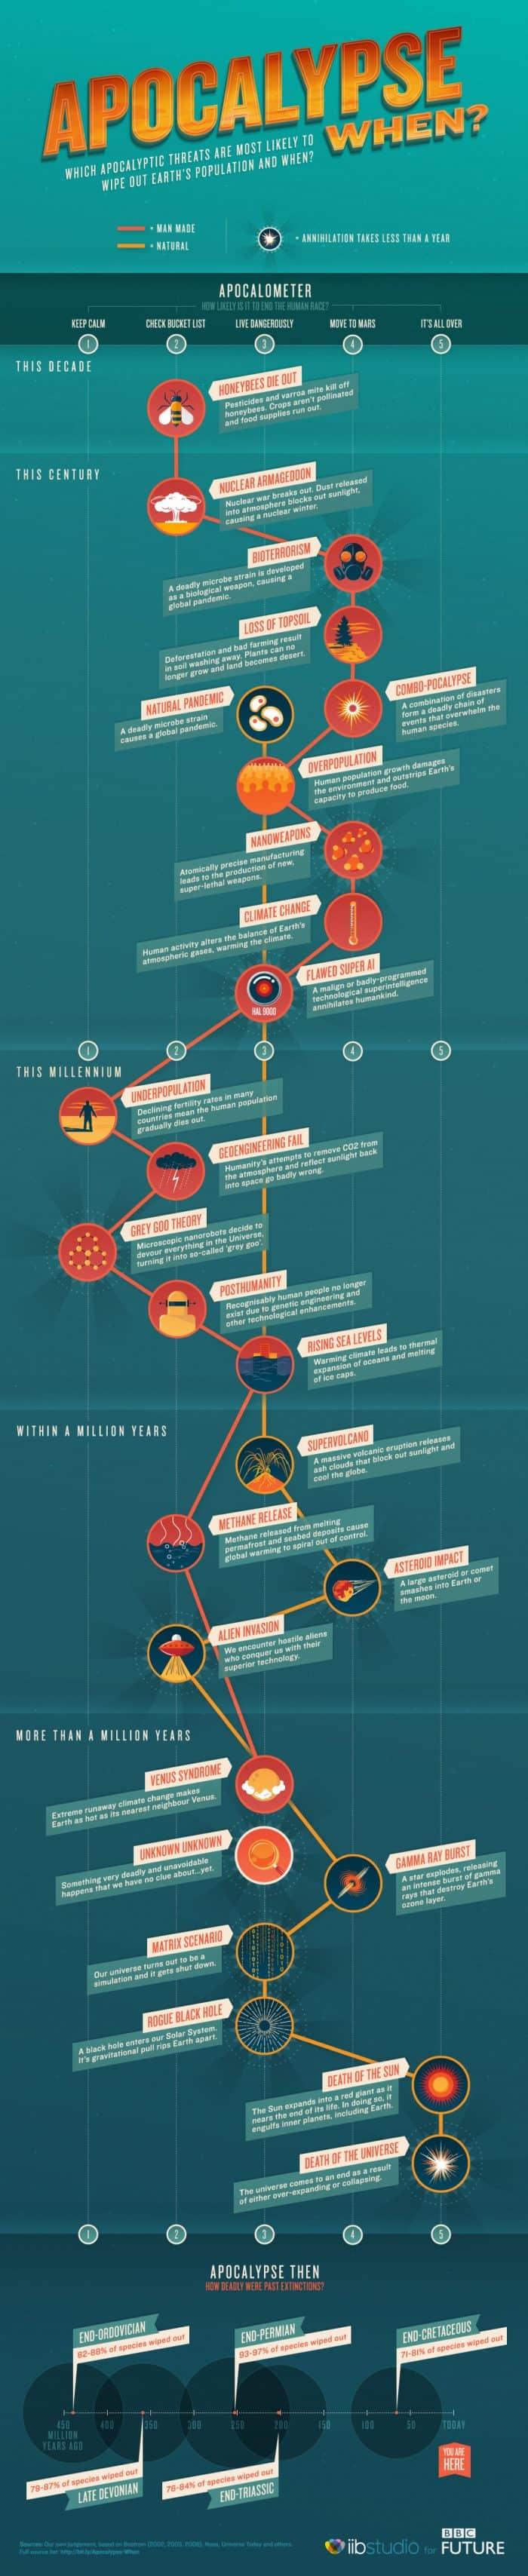 World-Ending Scenarios: This Is How The Apocalypse May Happen